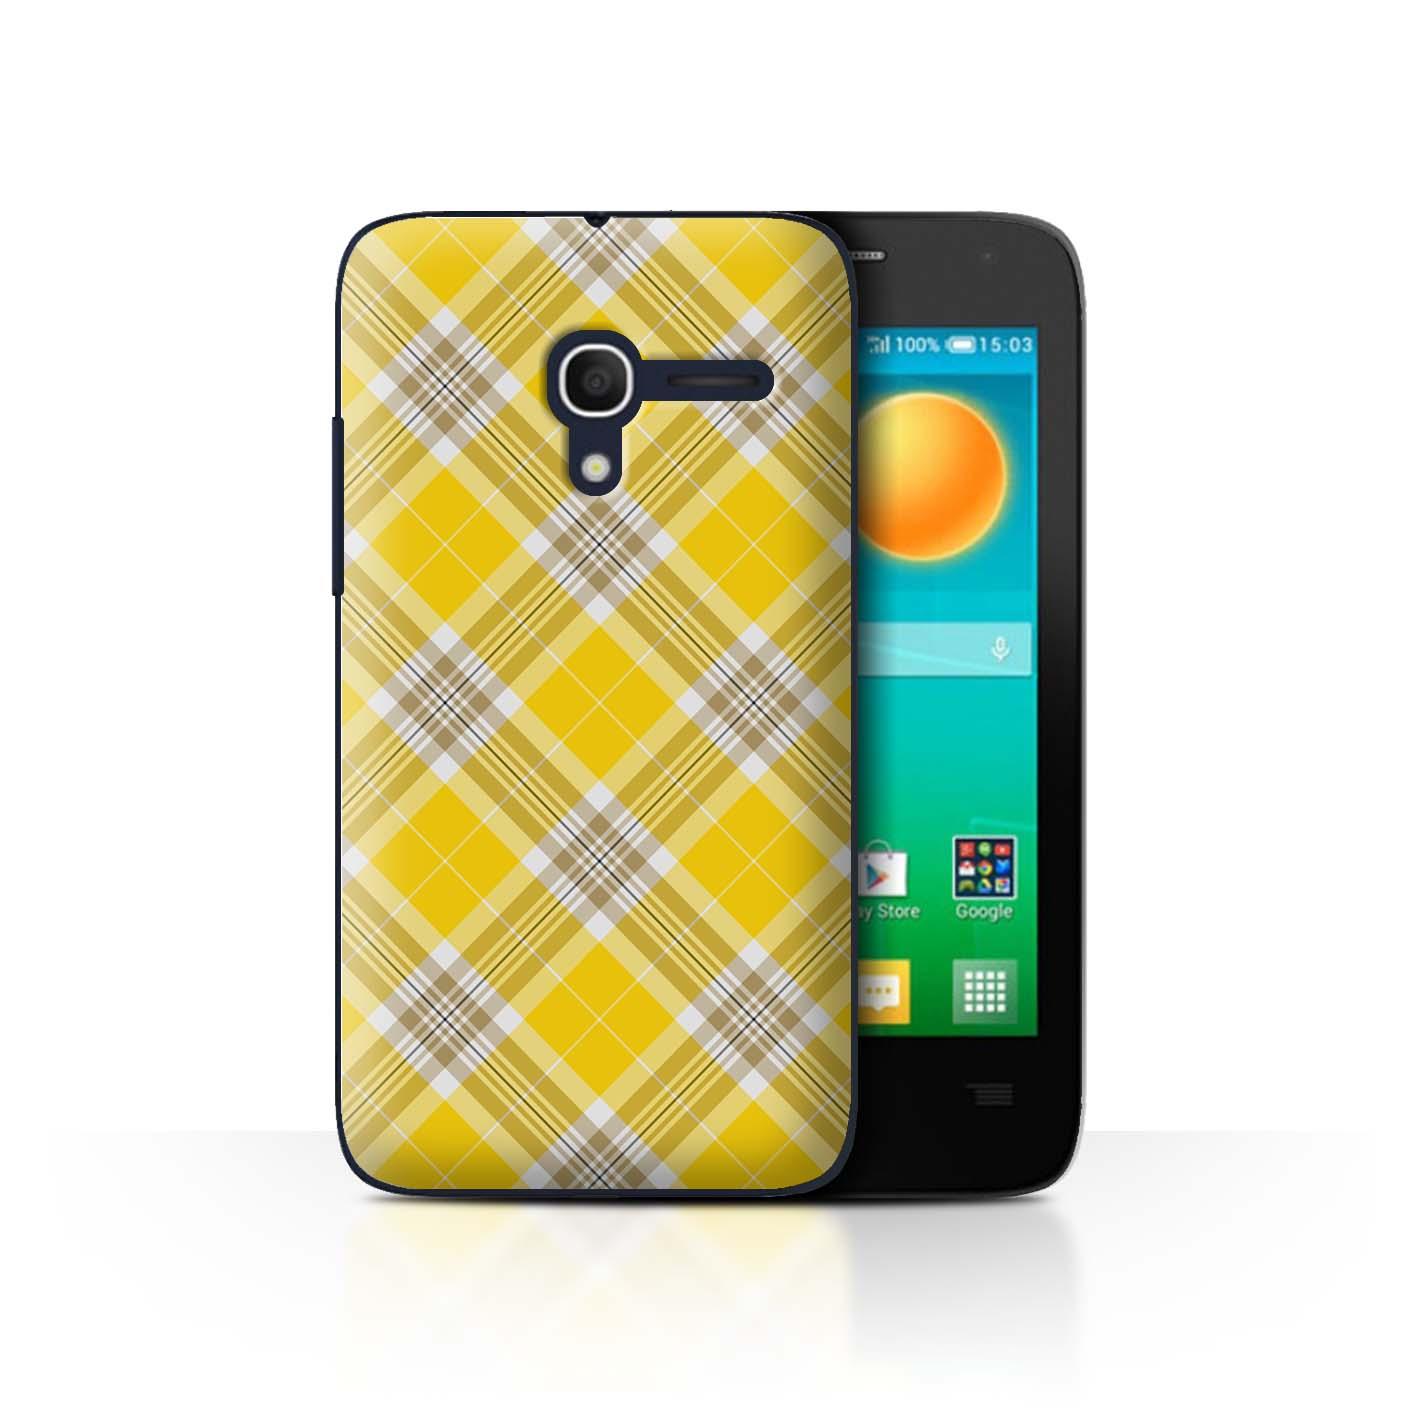 STUFF4-Back-Case-Cover-Skin-for-Alcatel-Pop-D3-Tartan-Picnic-Pattern